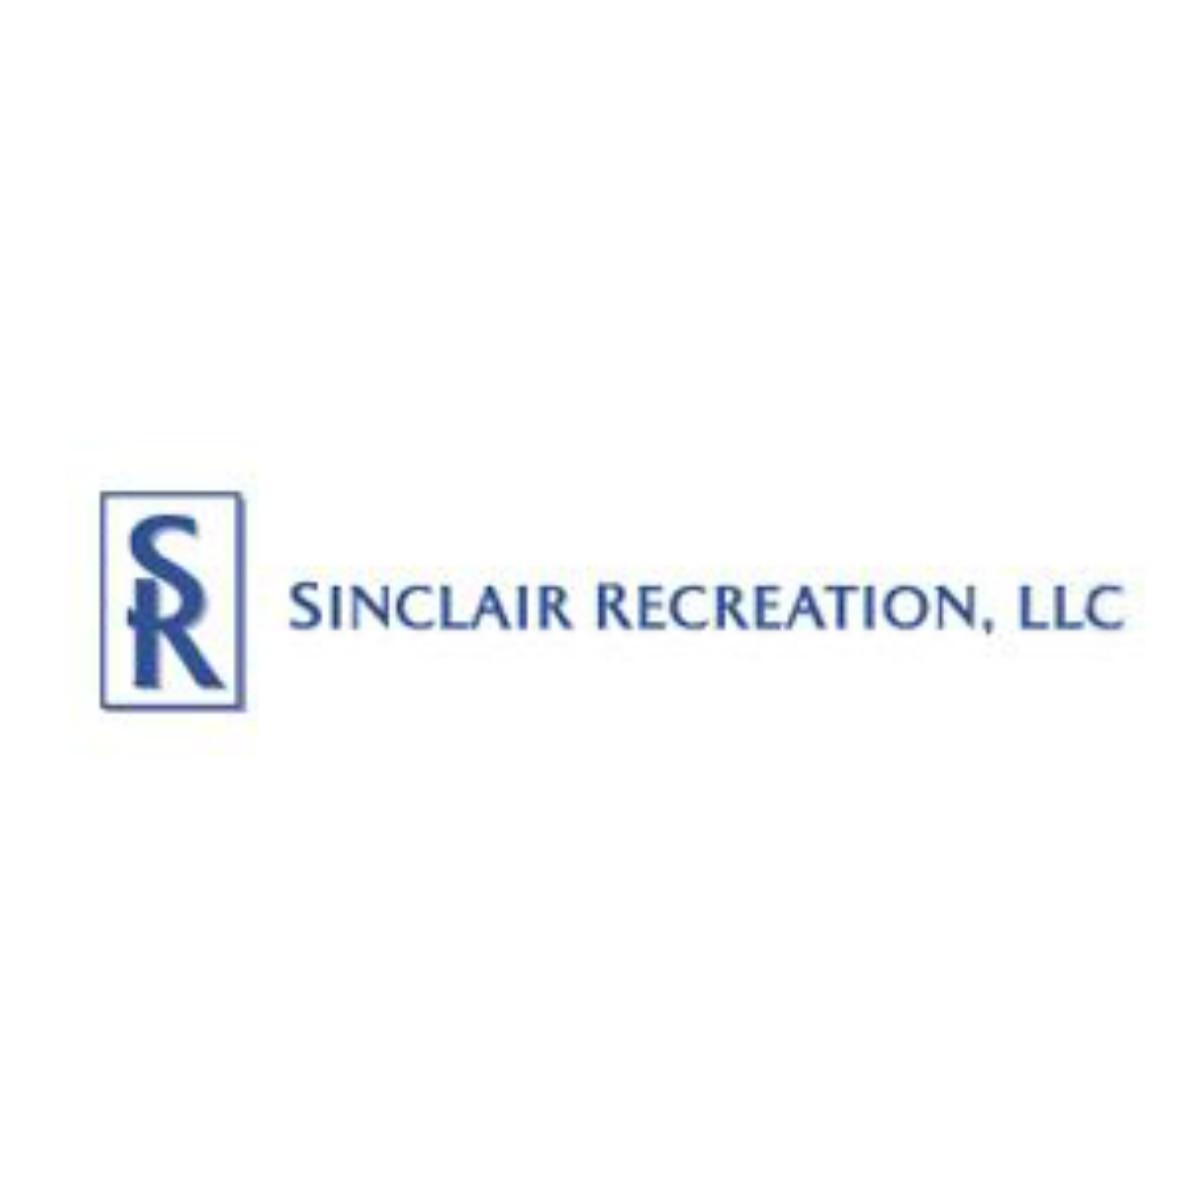 SINCLAIR RECREATION LLC image 14